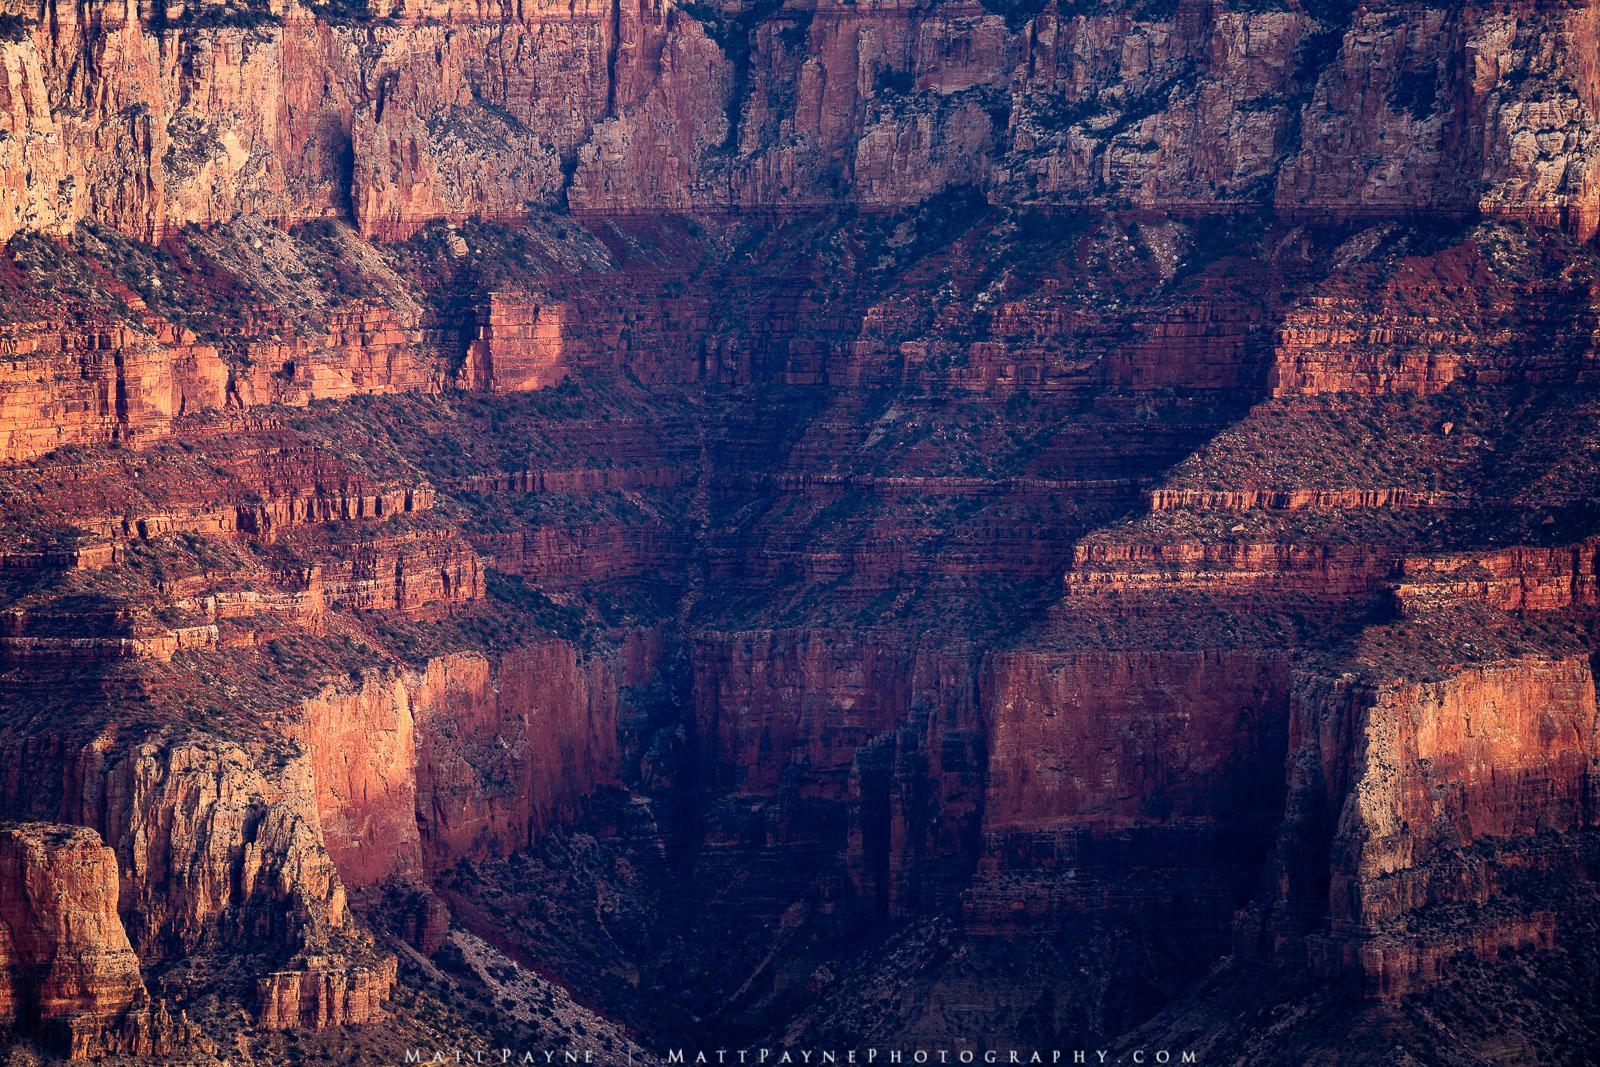 Cliffs, Erosion, Grand Canyon National Park, Sunrise, photo